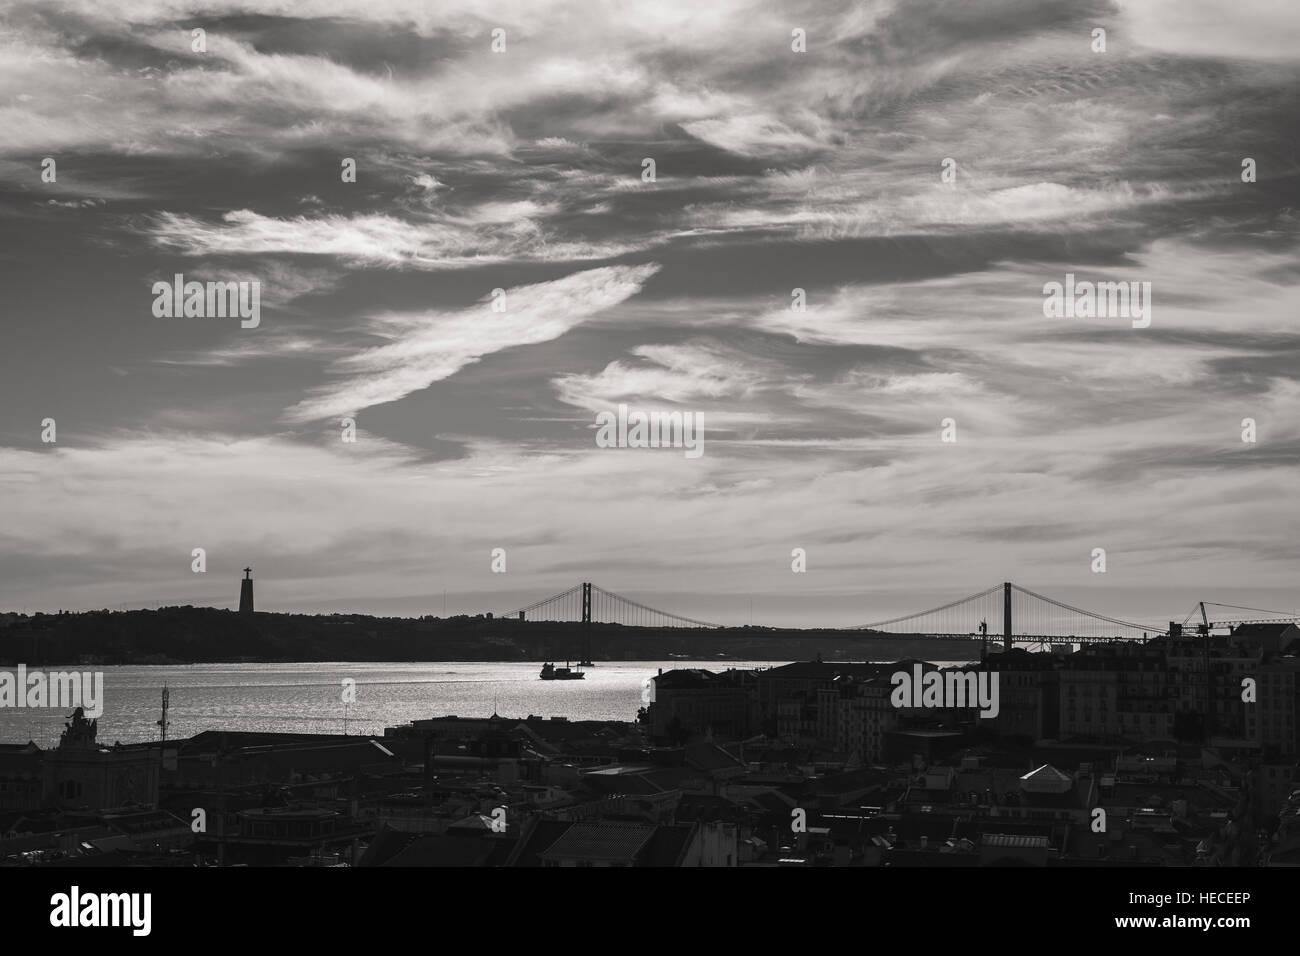 Lisbon -Tage River - Stock Image